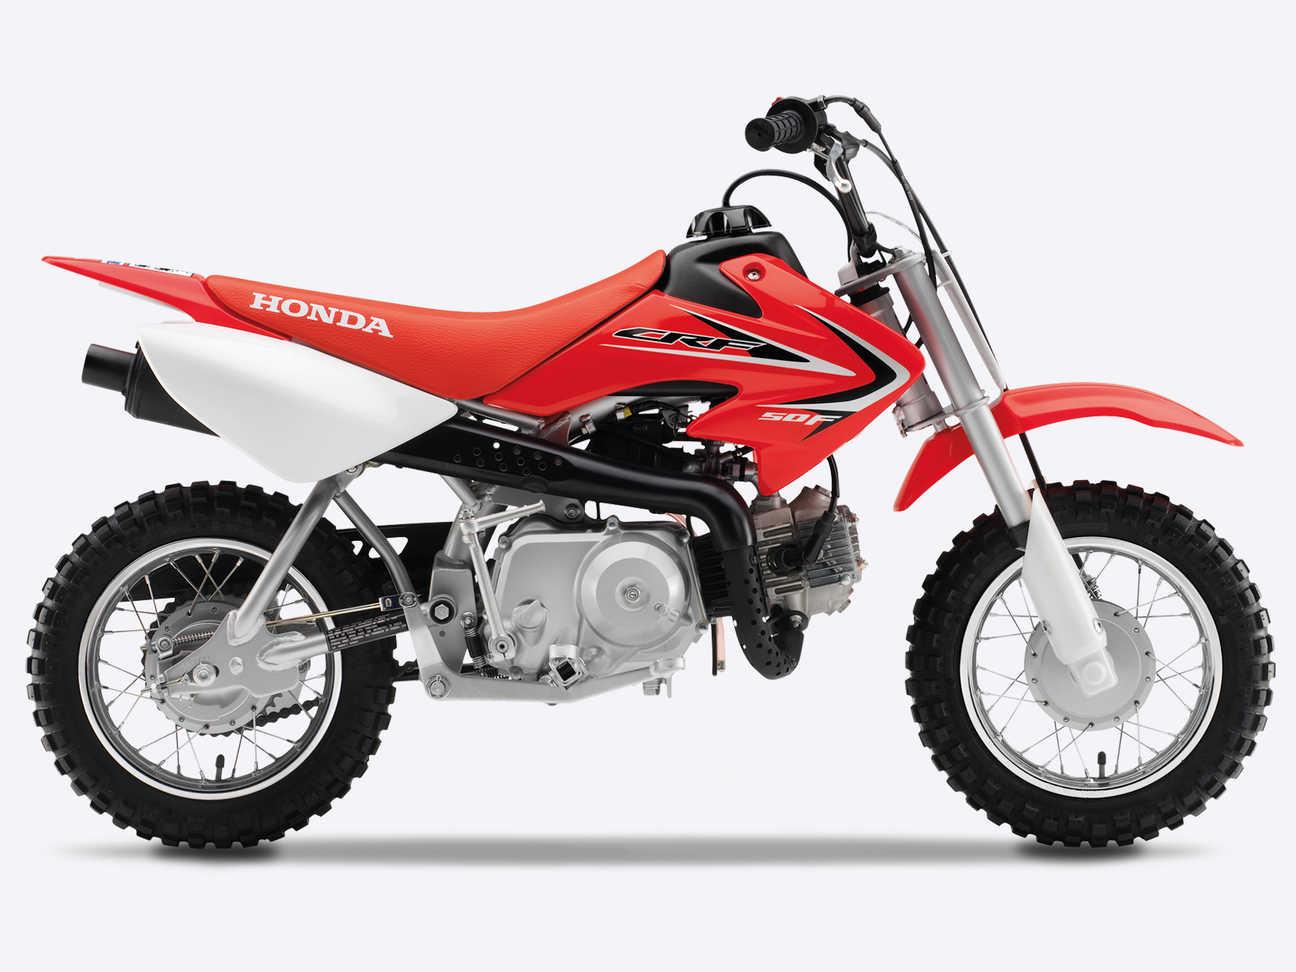 CRF50F | 50cc Mini Dirt Bike - Perfect for Kids | Honda UK